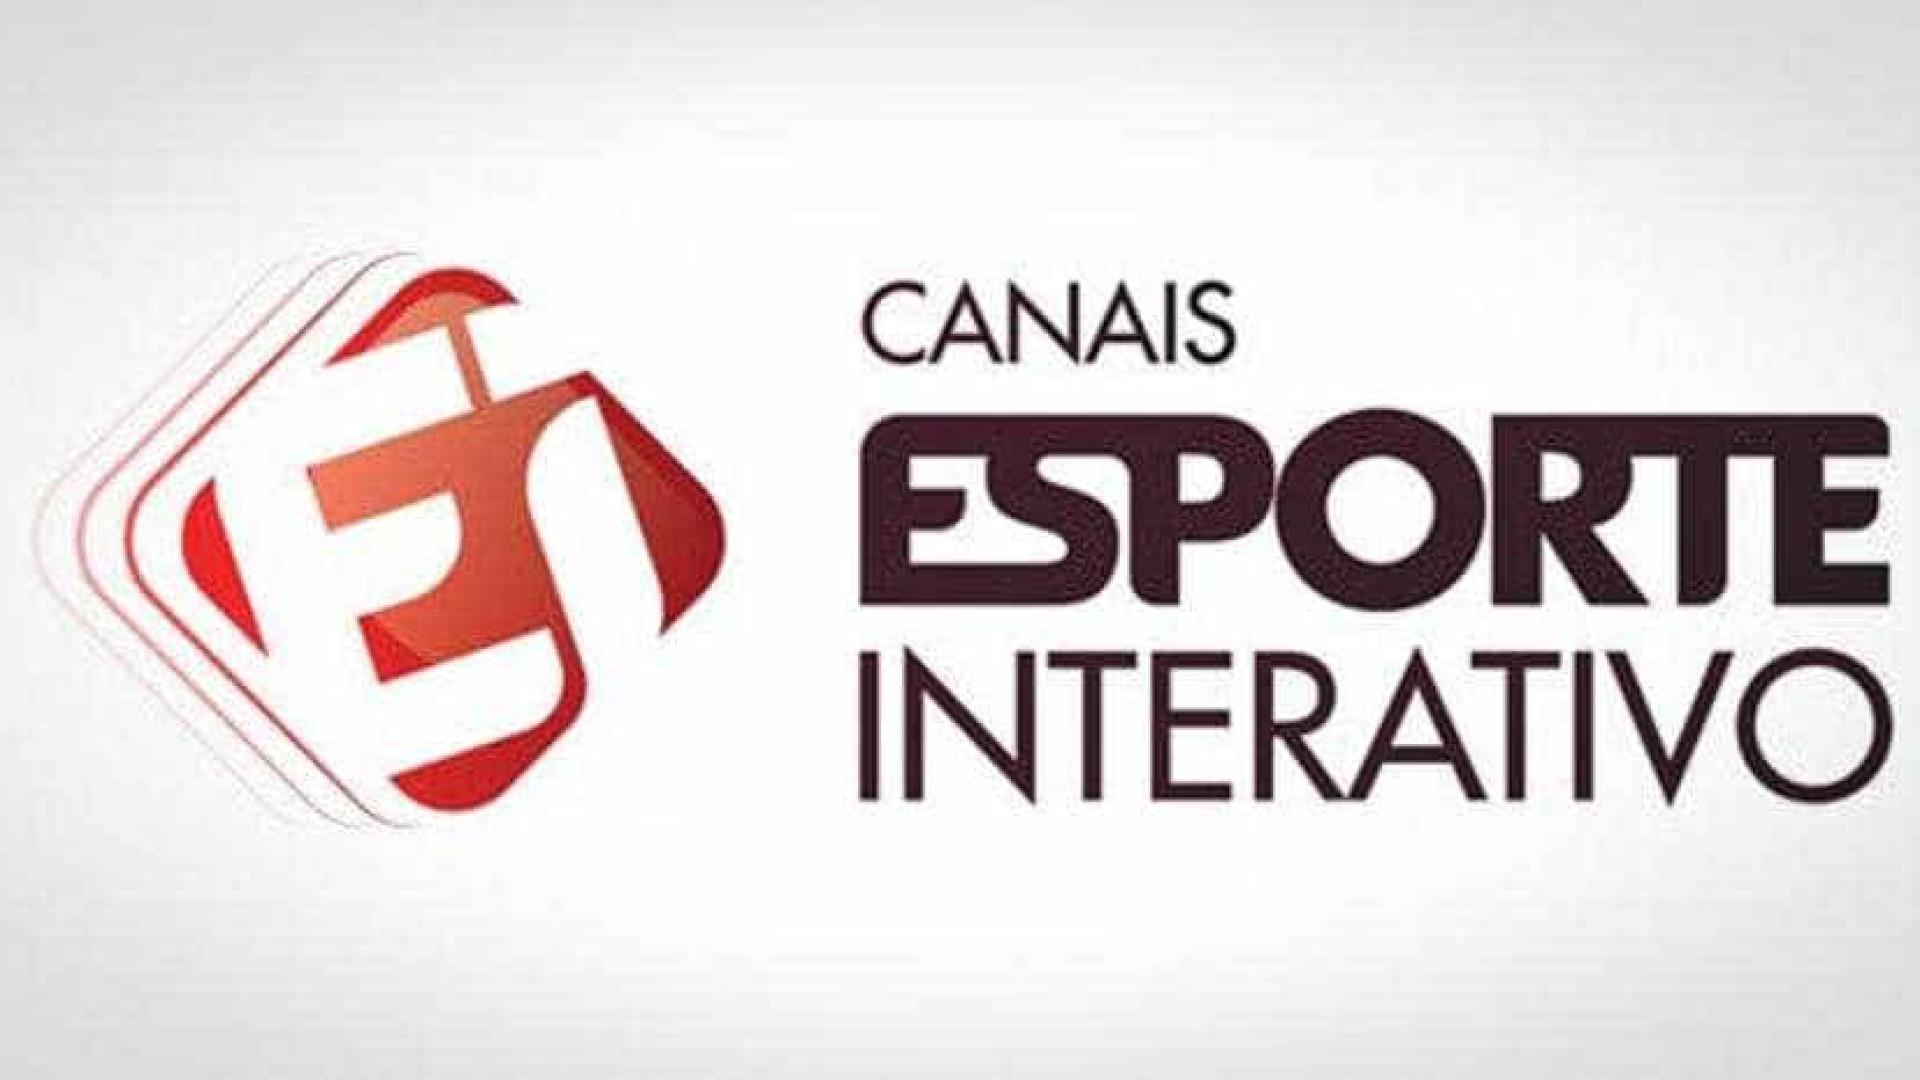 Esporte Interativo anuncia fechamento dos canais no Brasil